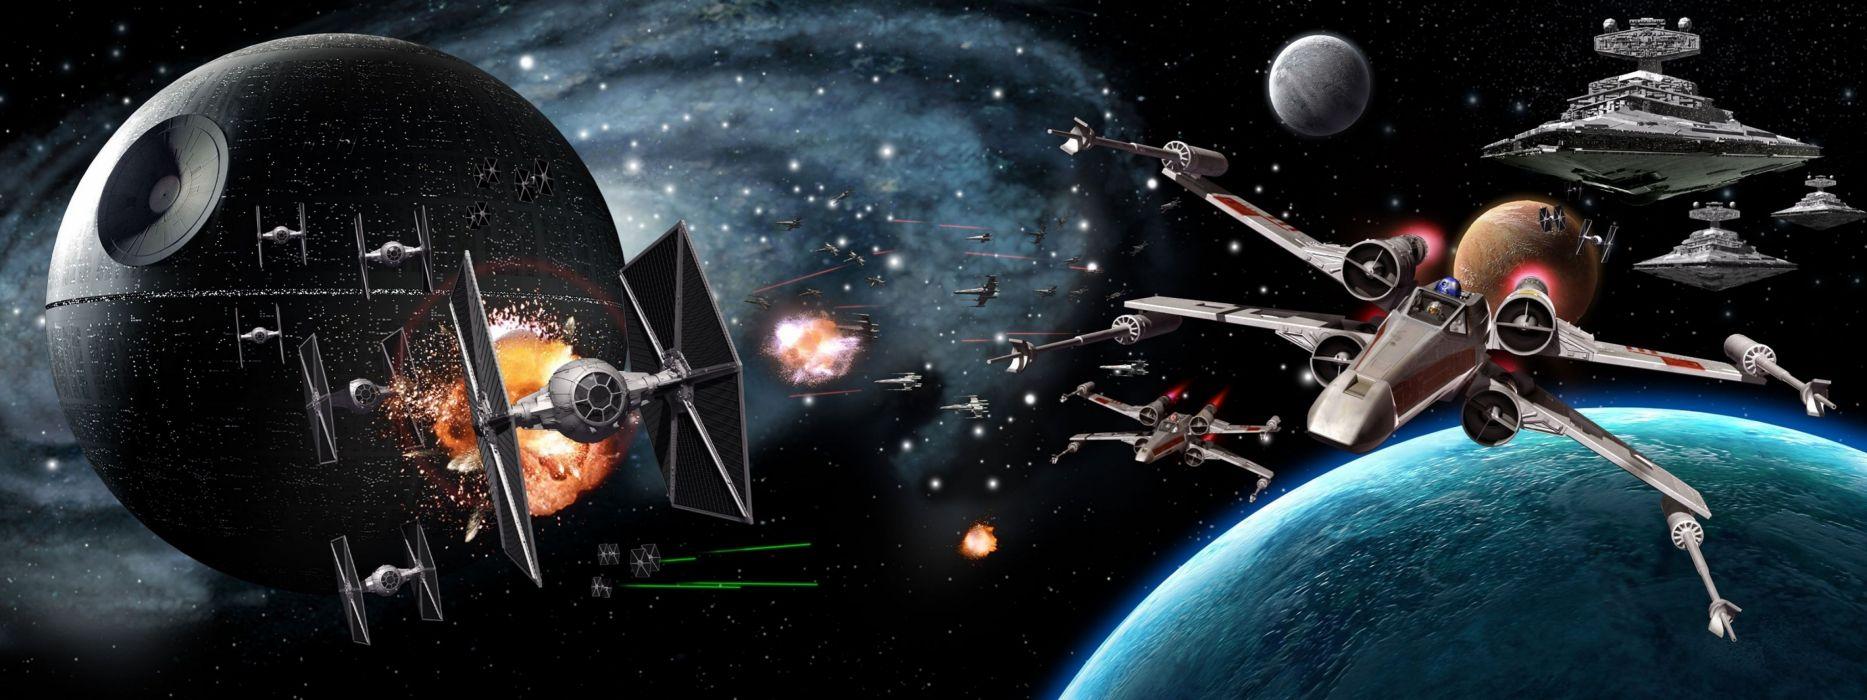 STAR WARS X -WING spaceship futuristic space sci-fi xwing wallpaper